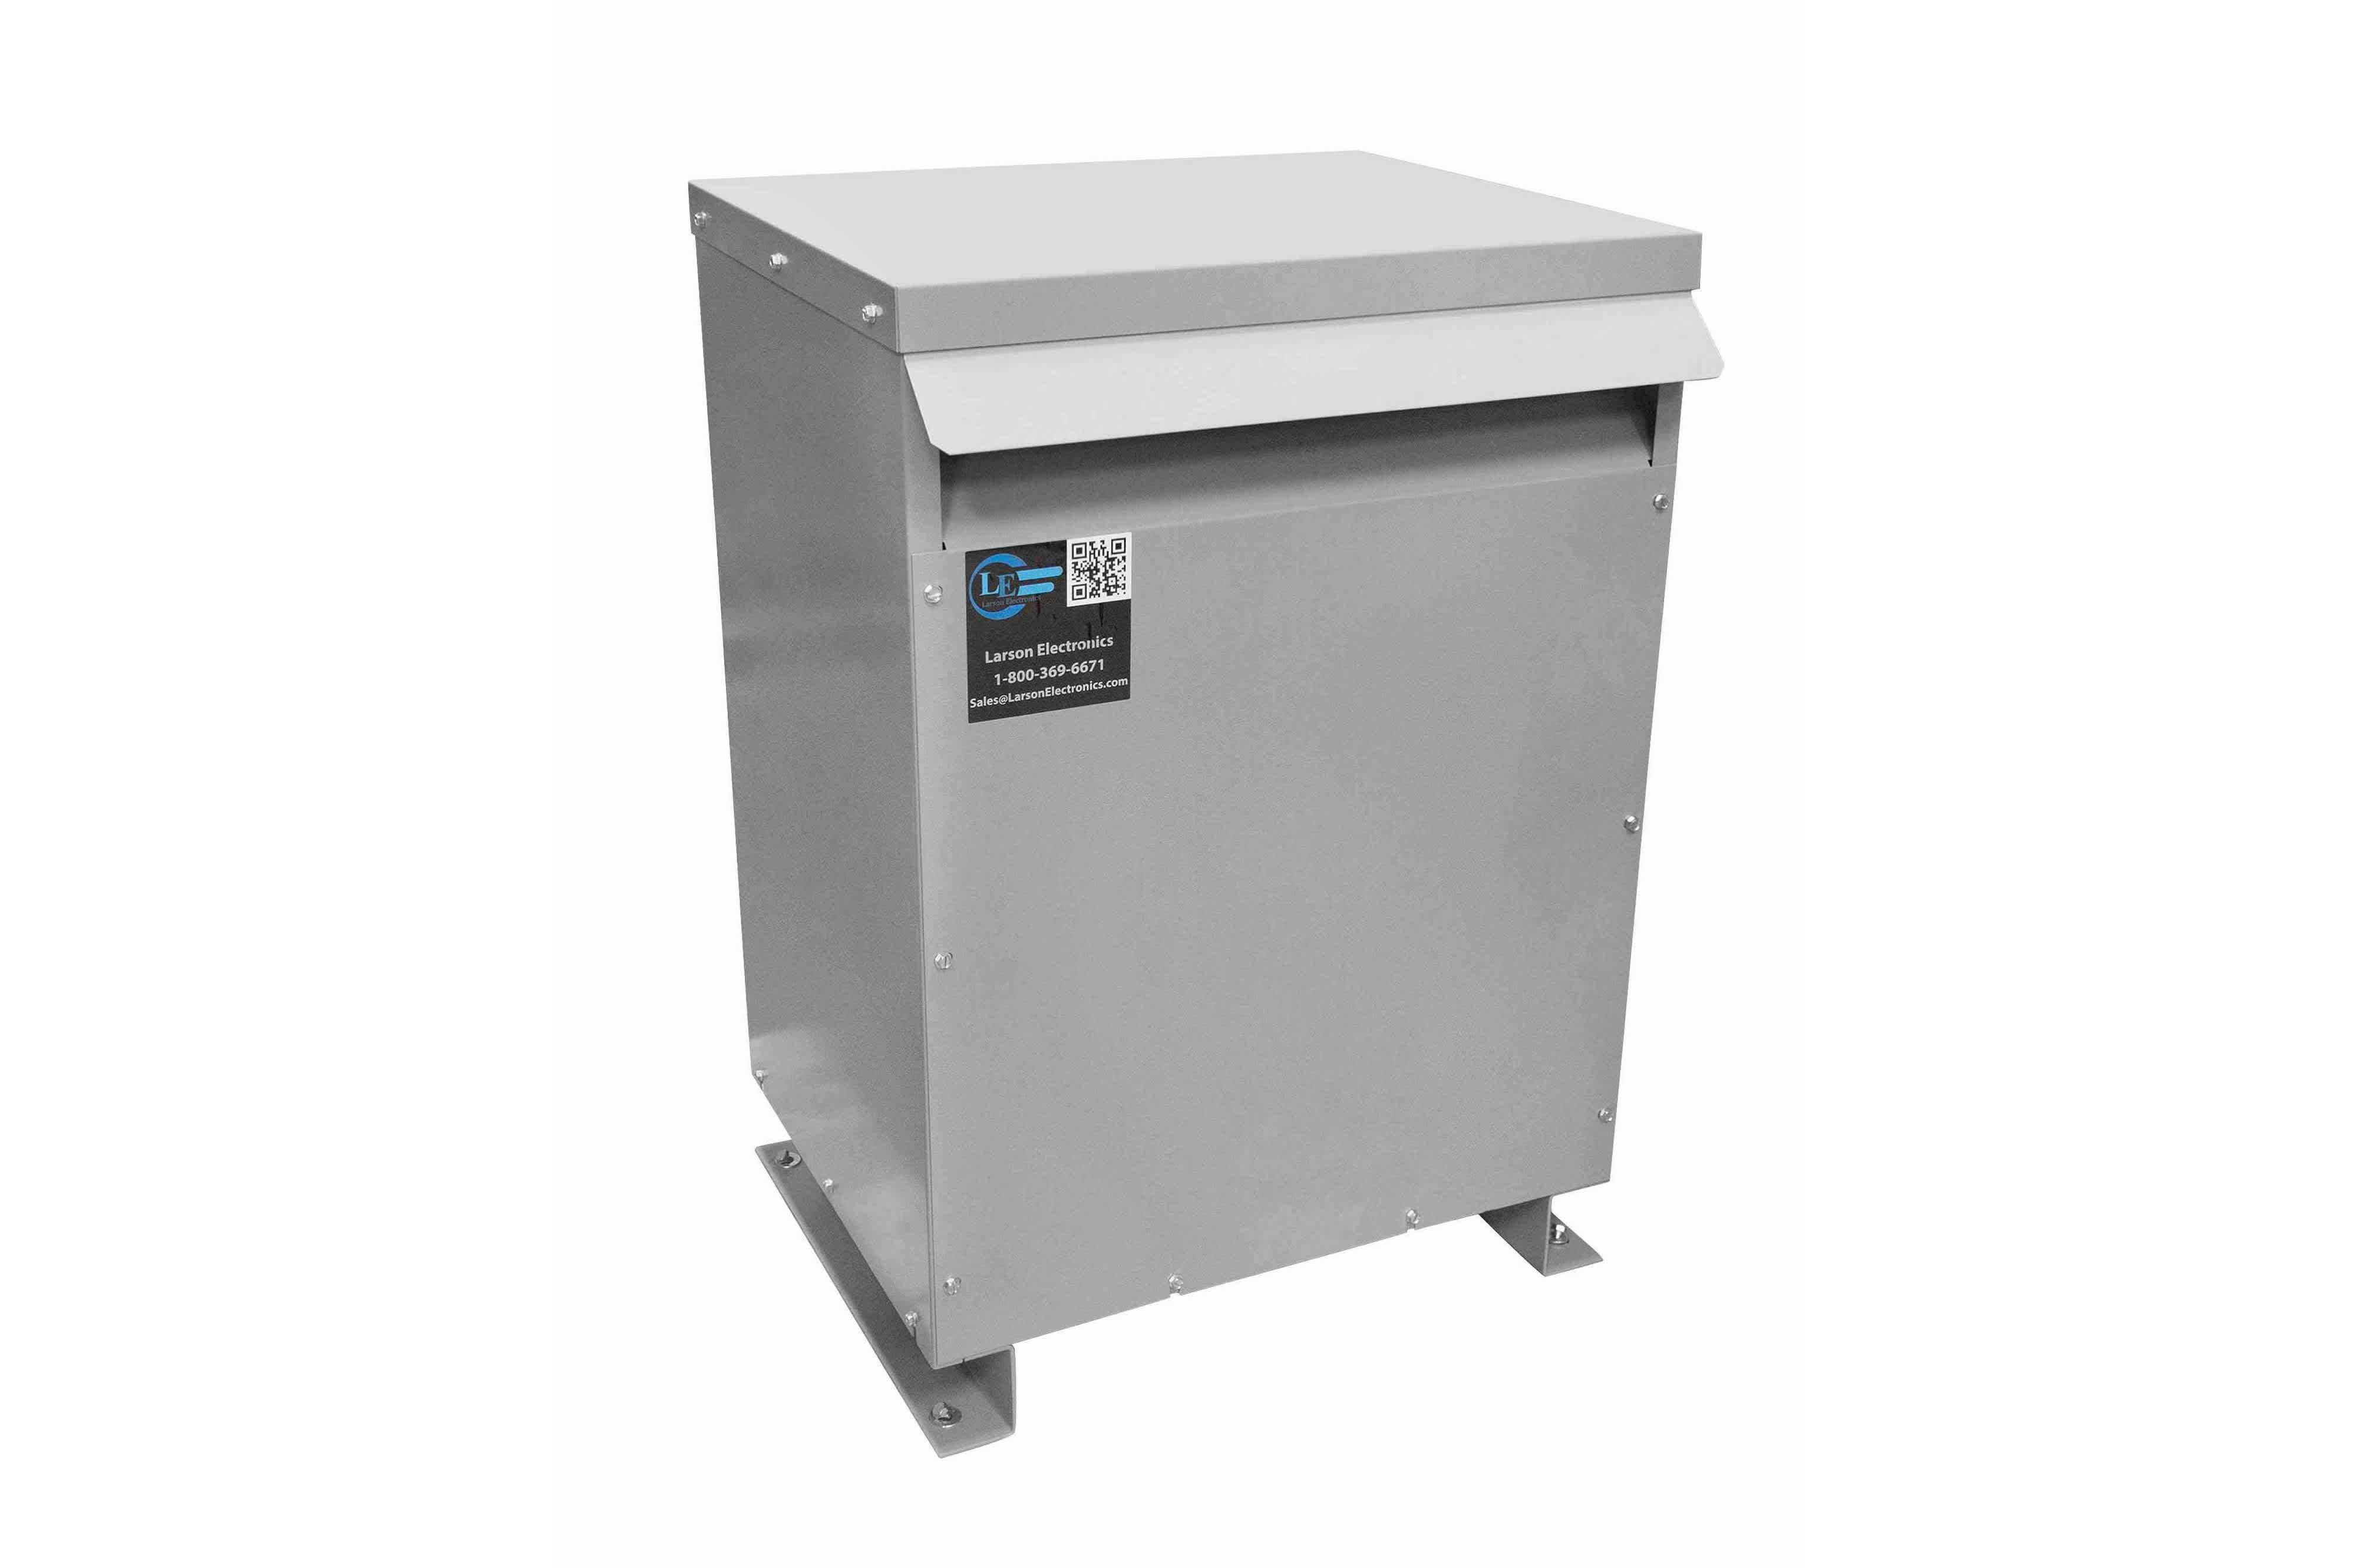 700 kVA 3PH Isolation Transformer, 575V Wye Primary, 380Y/220 Wye-N Secondary, N3R, Ventilated, 60 Hz